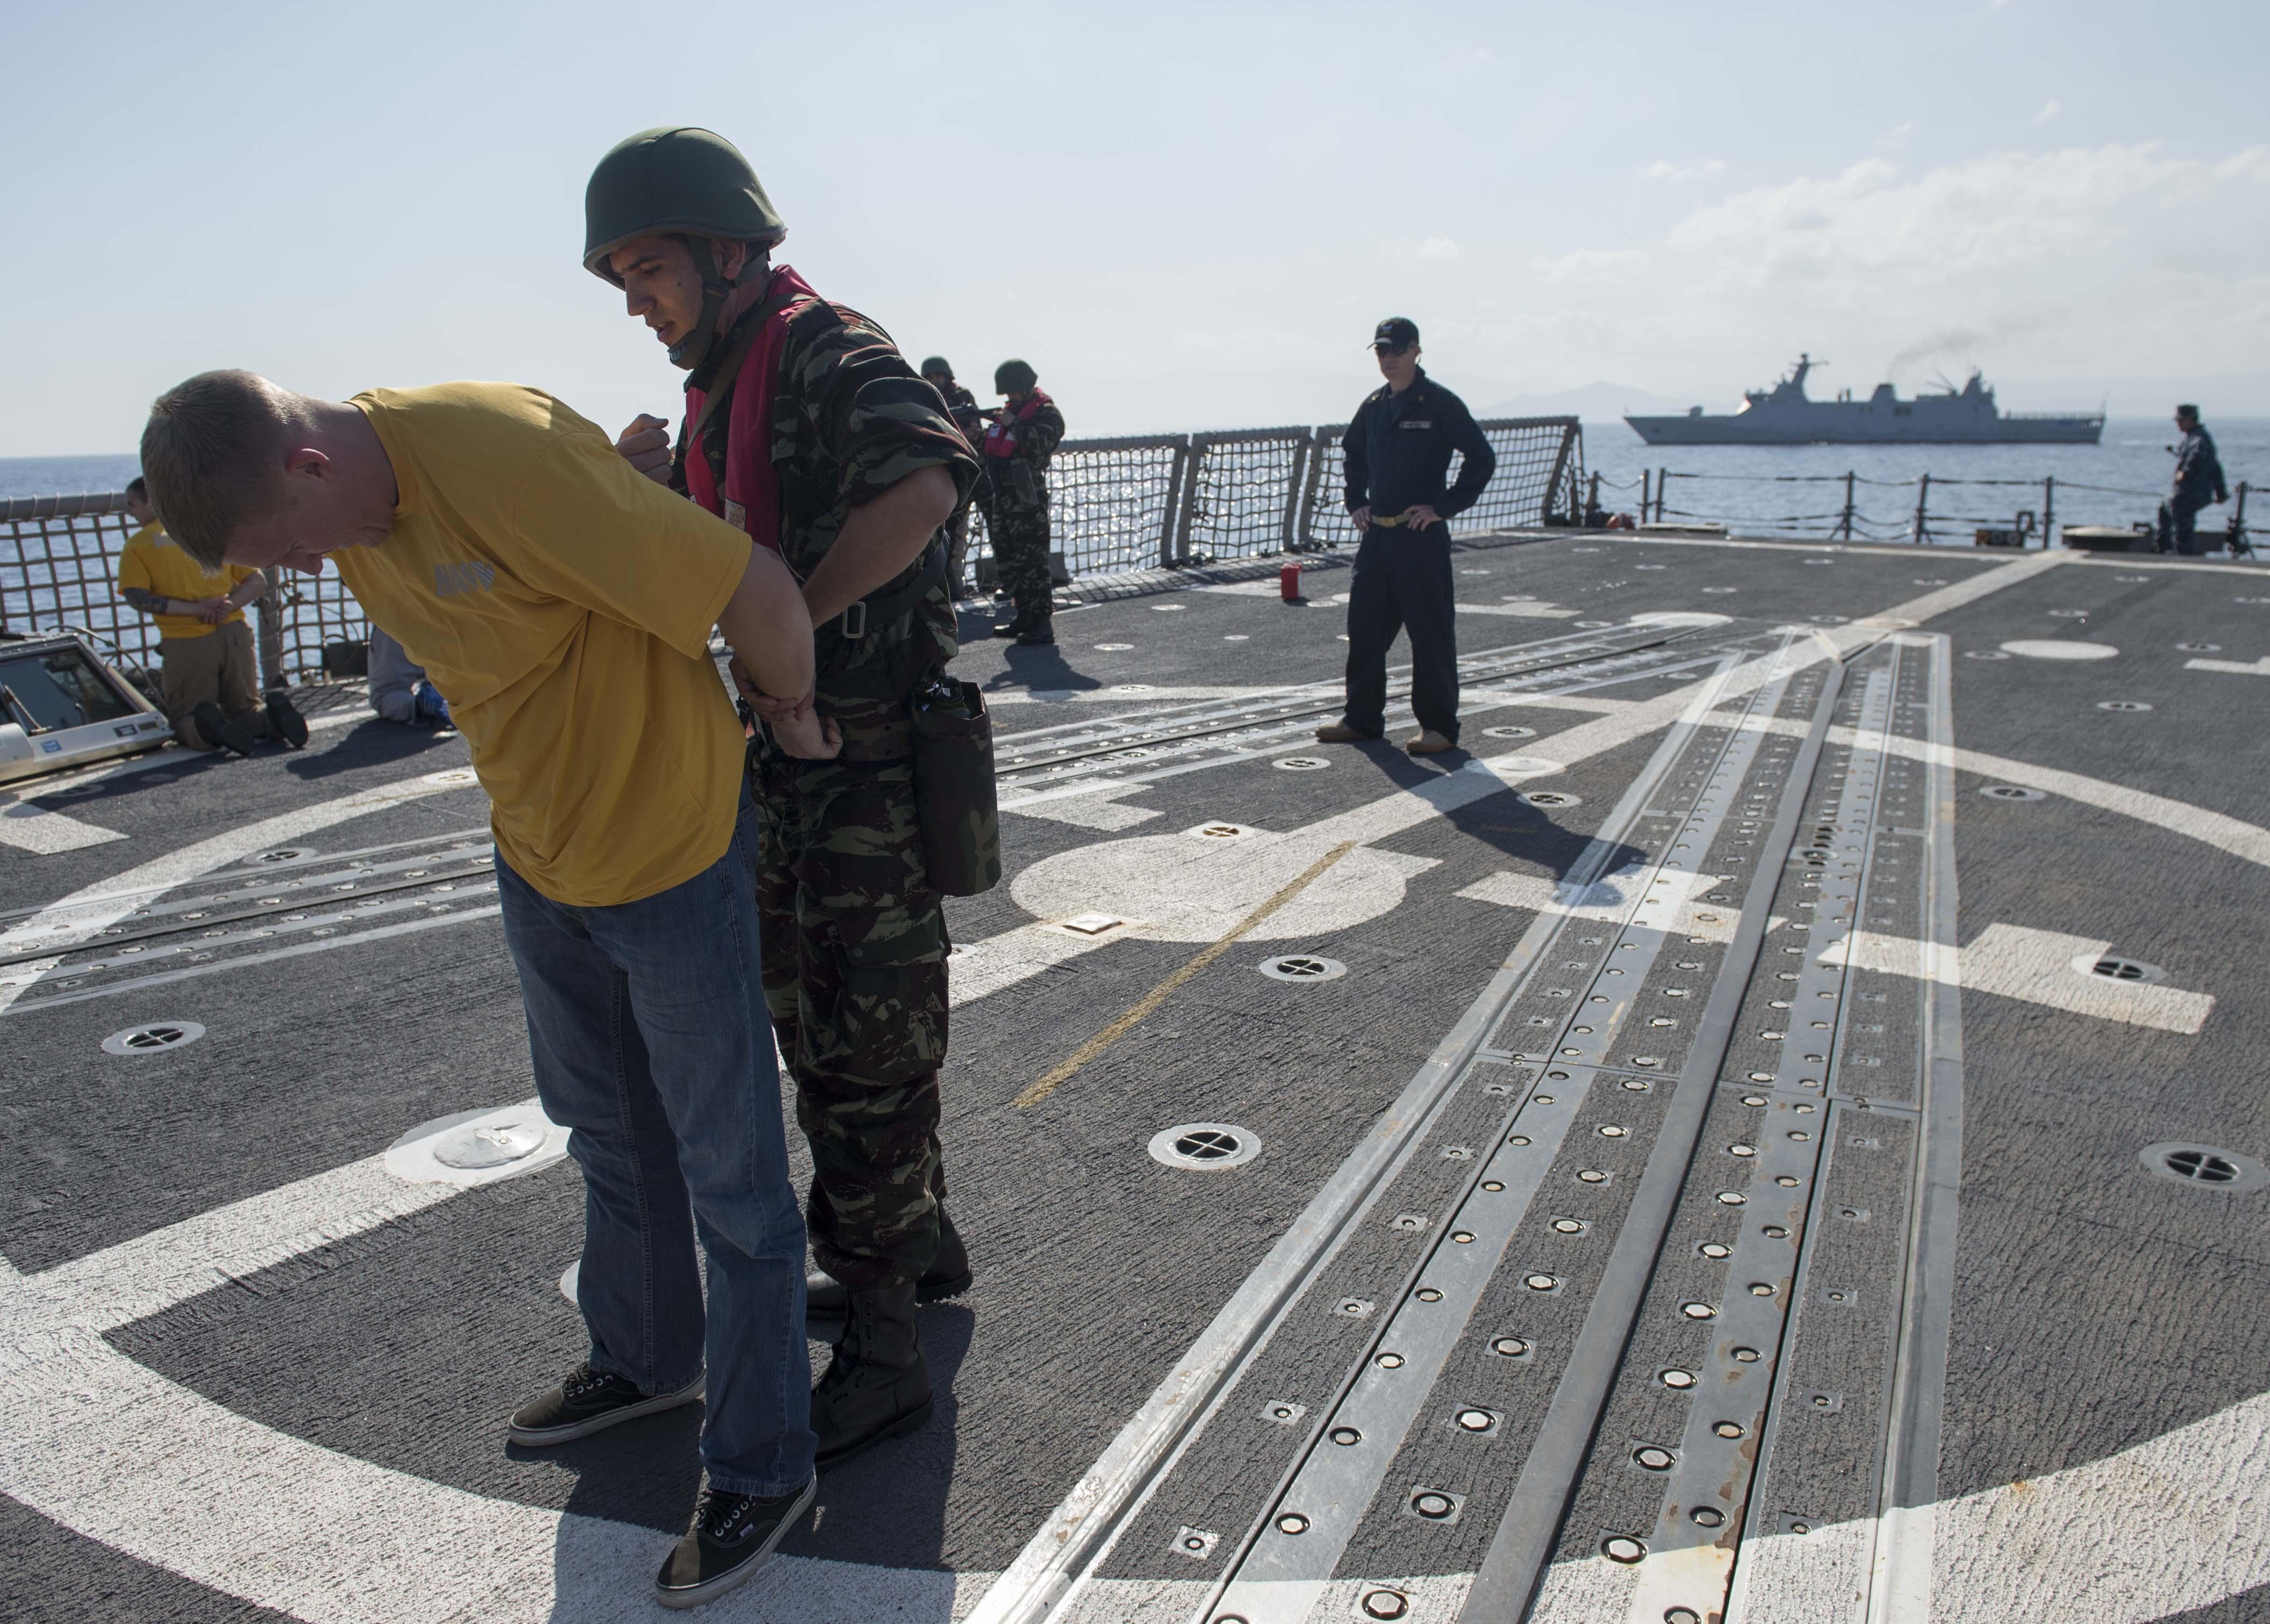 PASSEX 2014-1 ( USS Elrod (FFG55) et RMN Allal Ben Abdellah (615) ) 12363700495_80982577b1_o